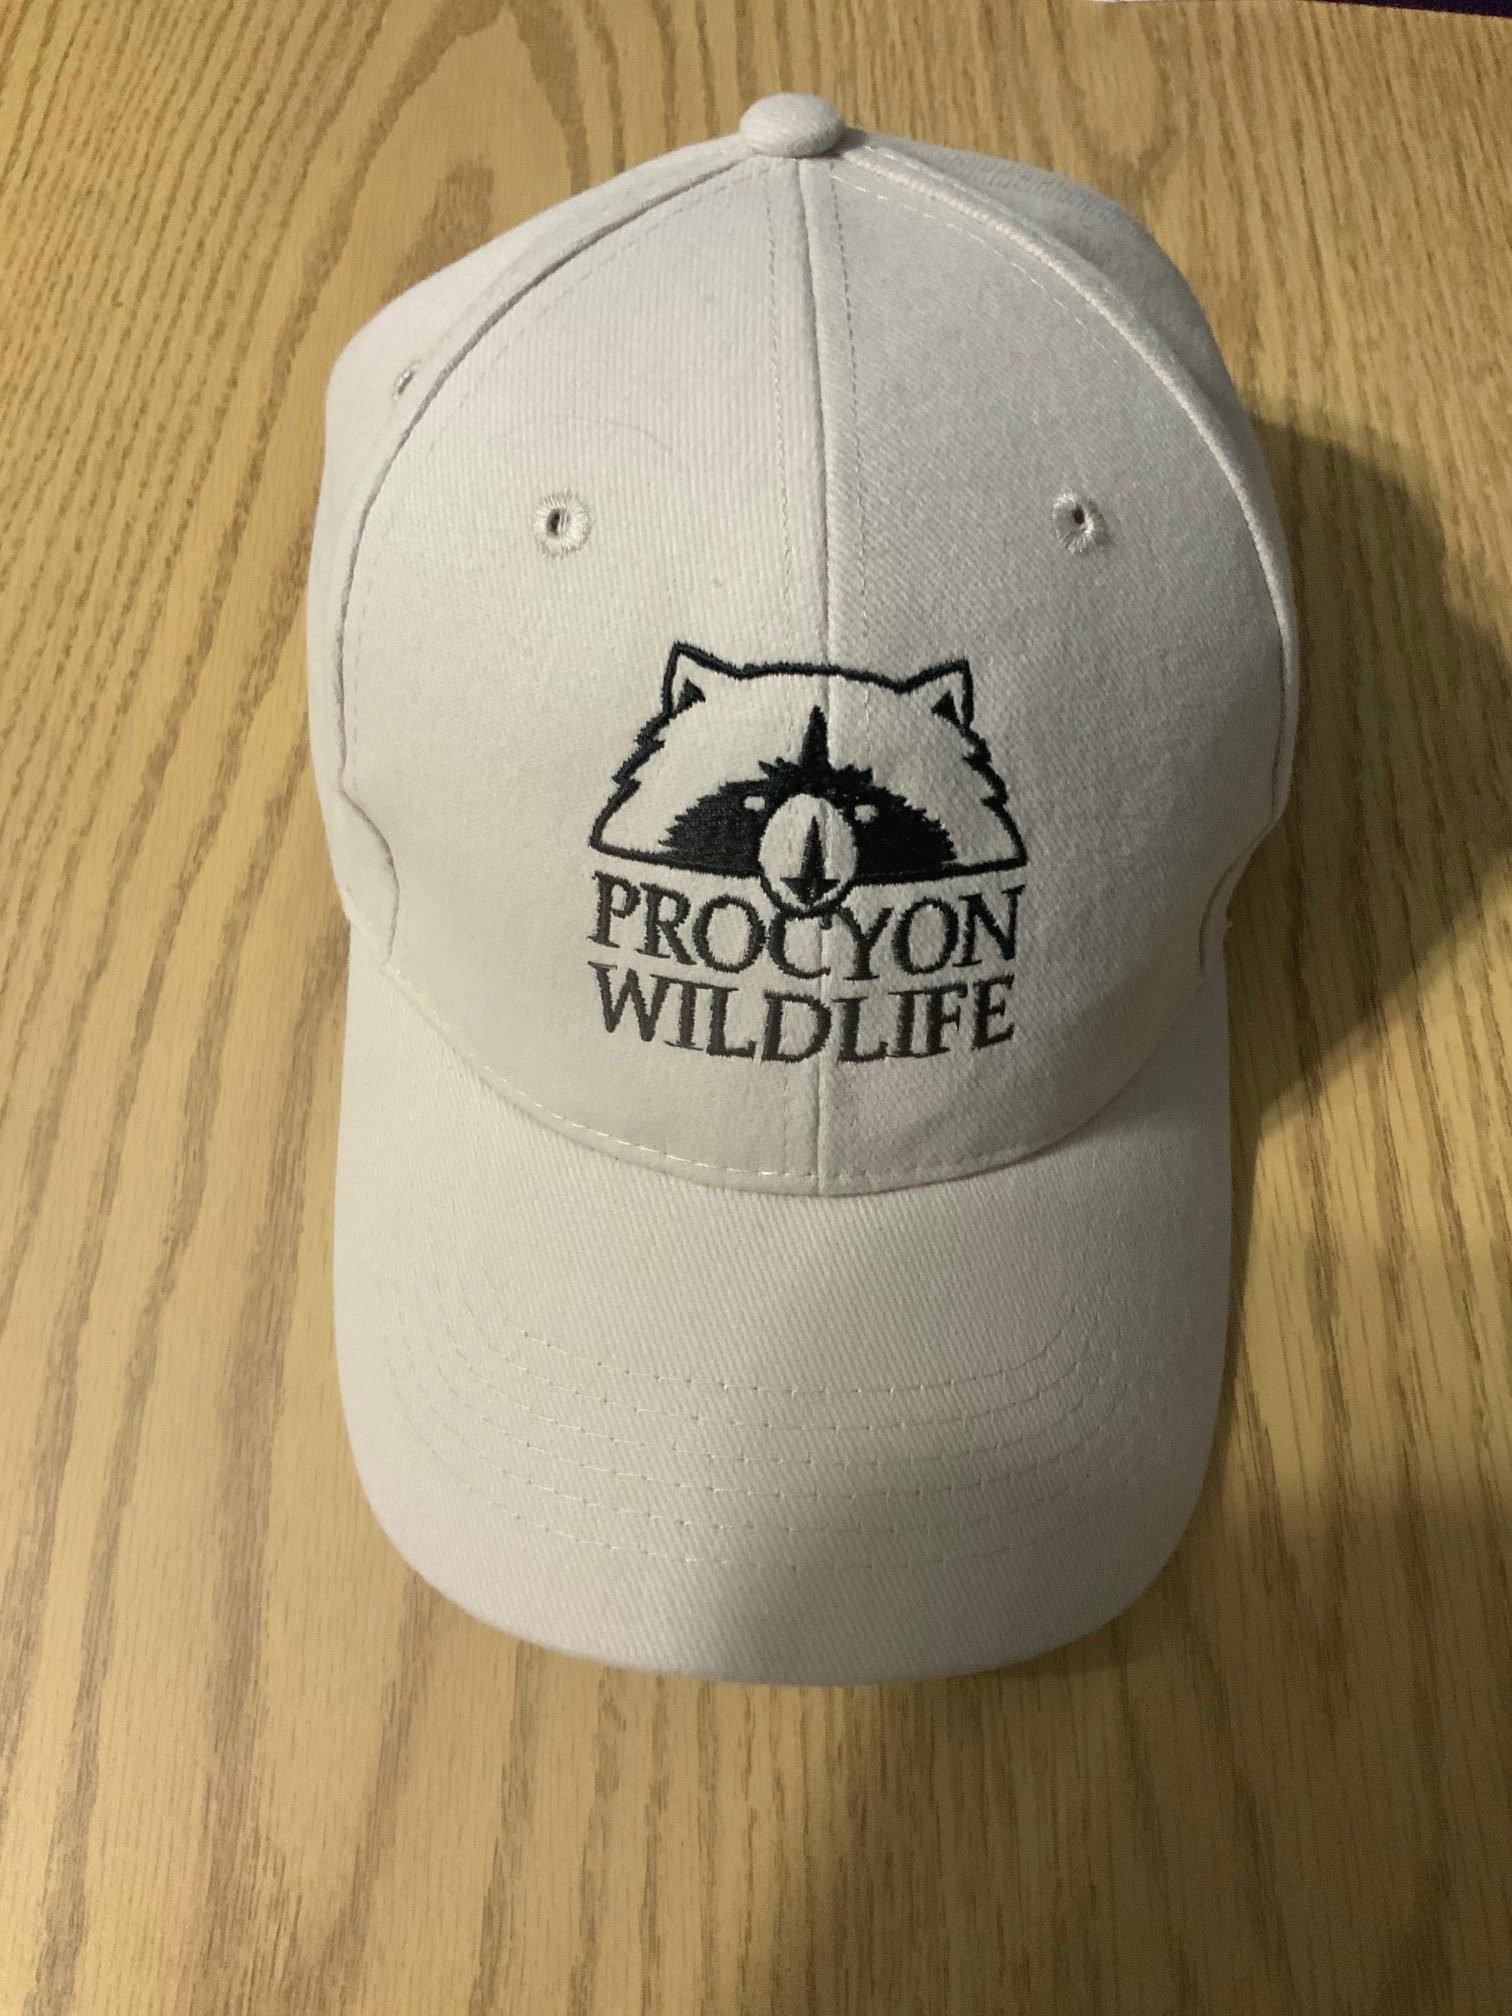 Baseball Hats - Procyon Wildlife